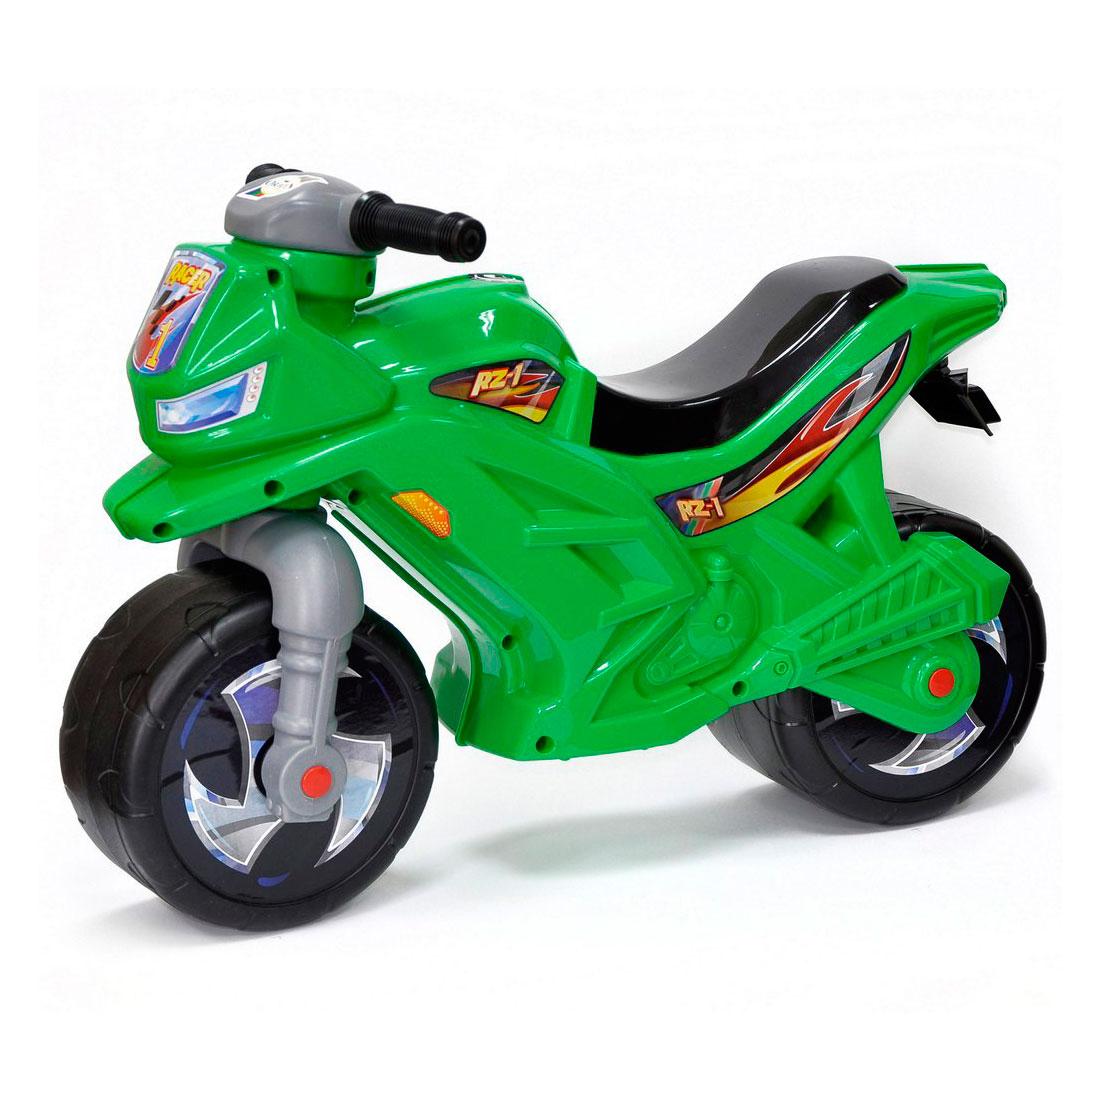 Каталка-беговел RT Racer ОР501 Зеленая